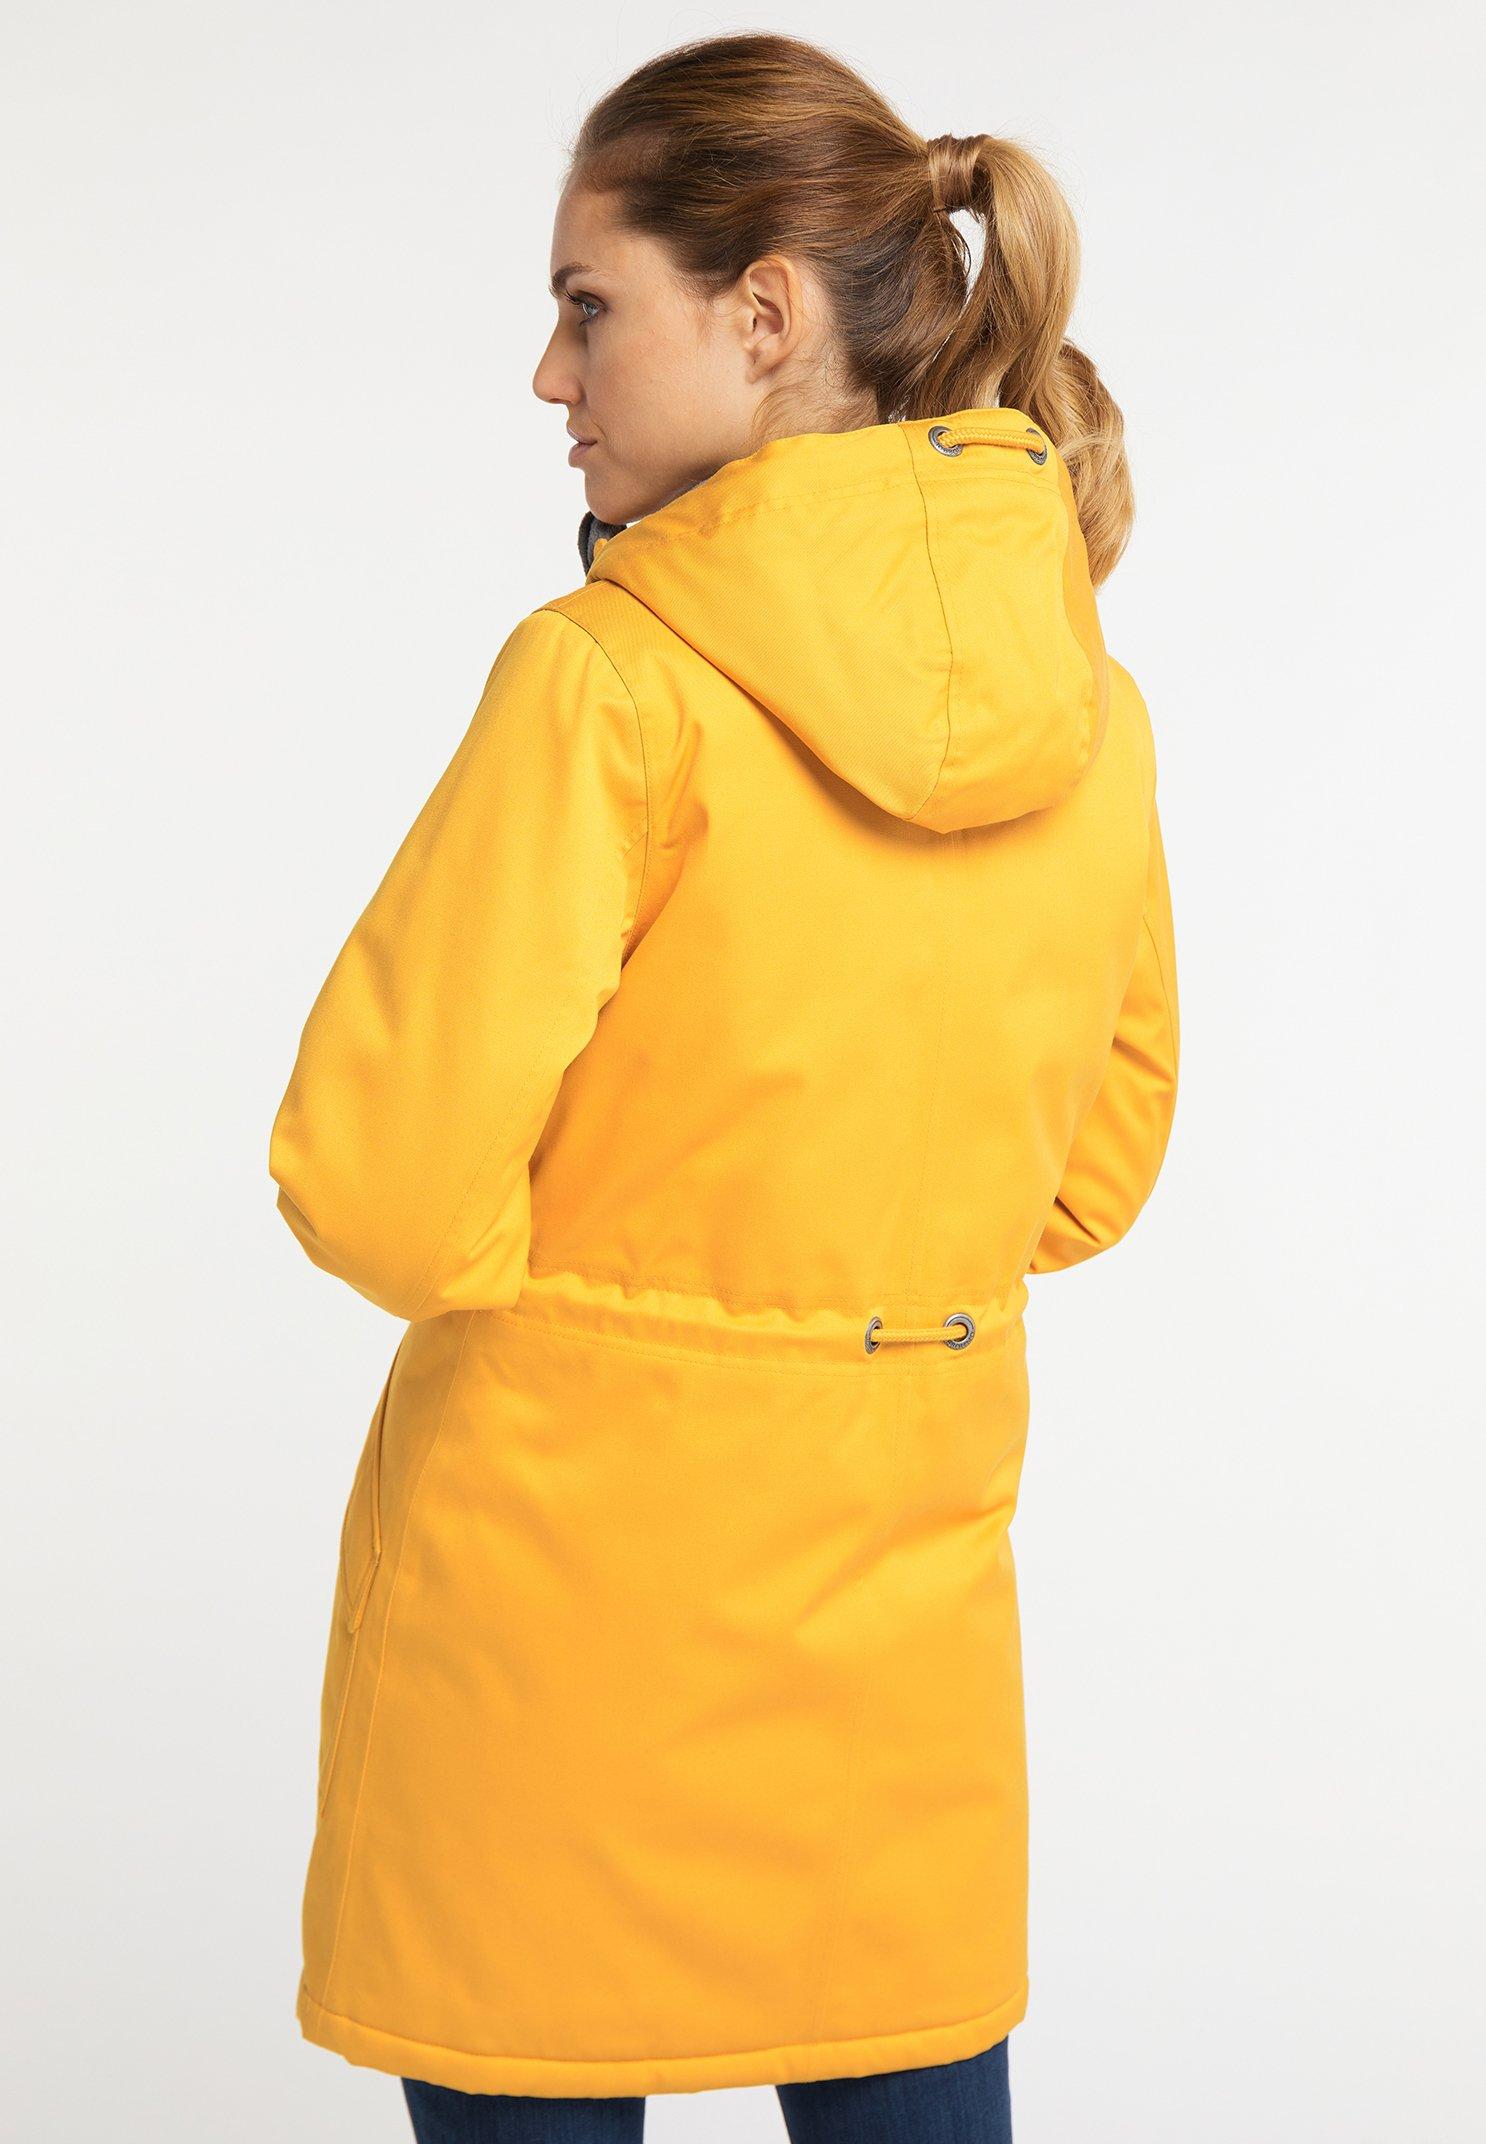 Icebound Veste D\'hiver - Mustard Yellow